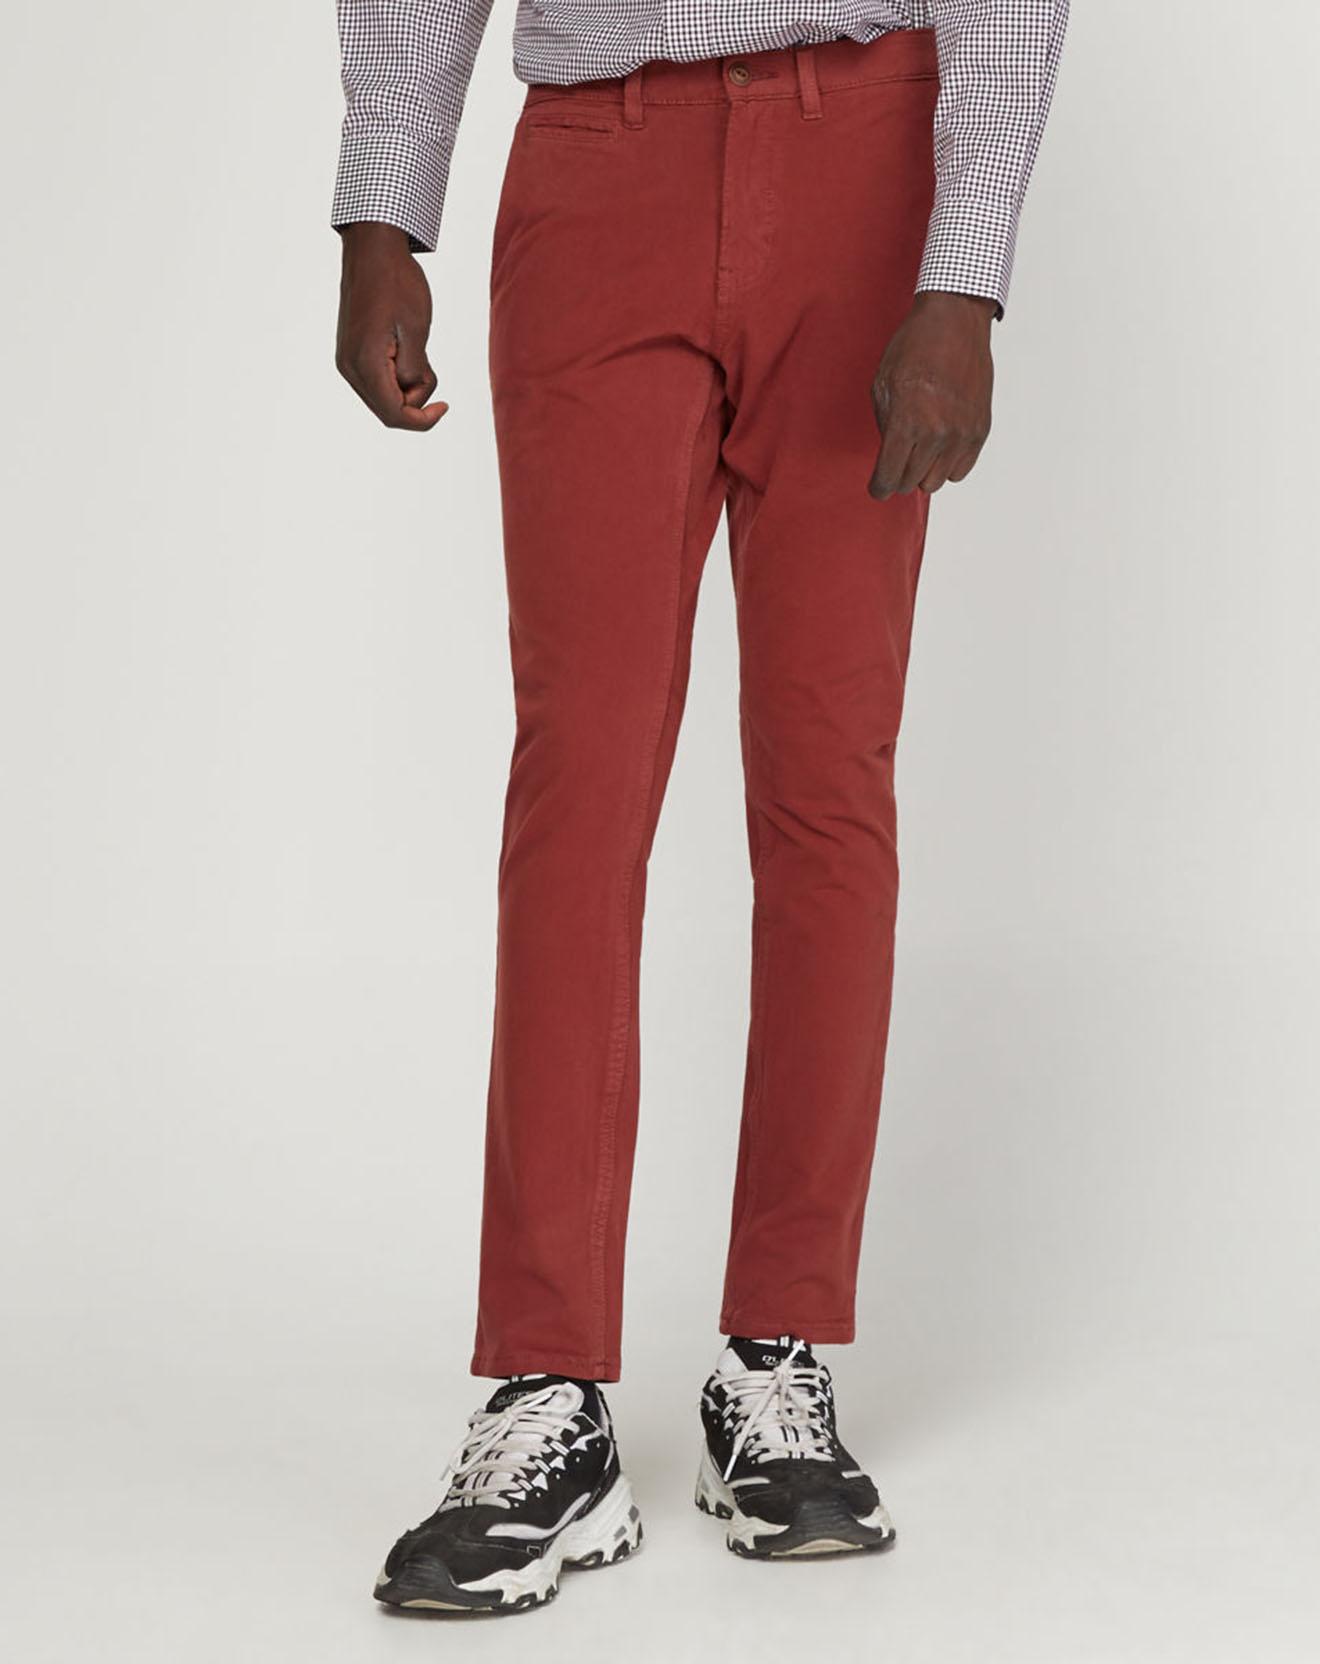 Pantalon chino Slim Krandi bordeaux - Quiksilver - Modalova